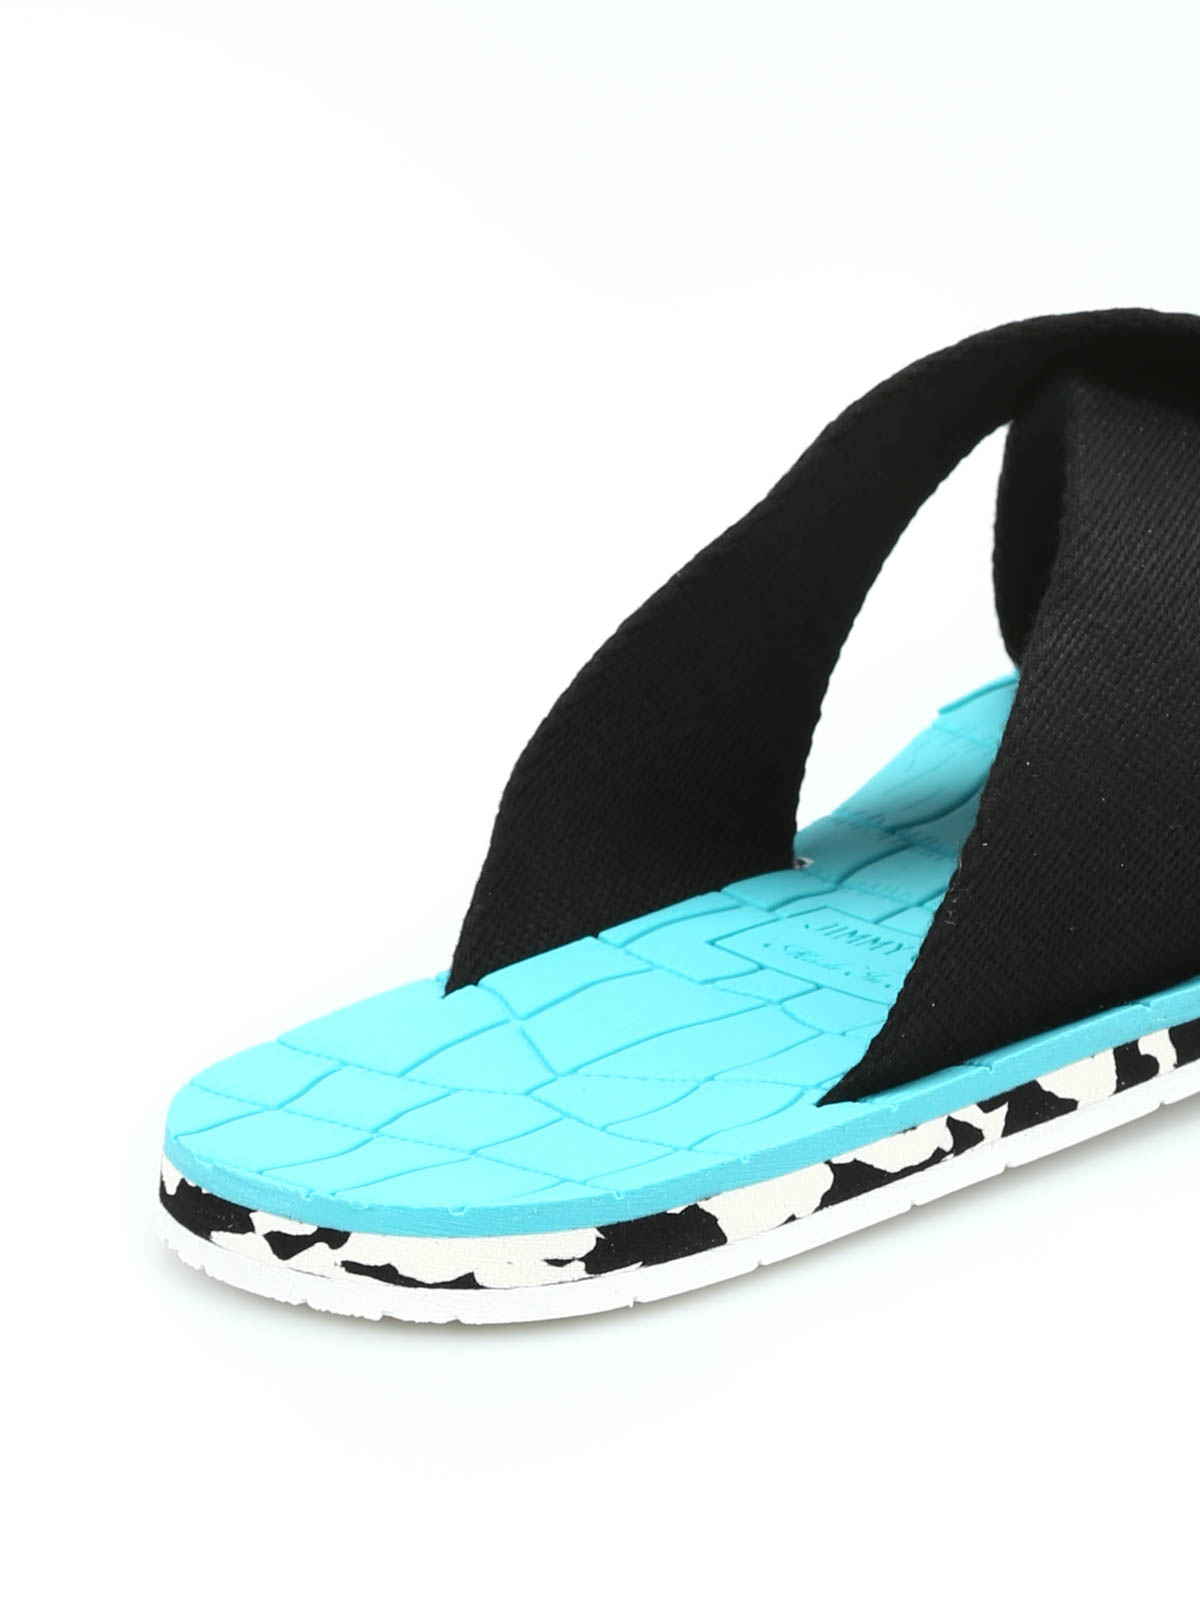 54561dcc112 Jimmy Choo - Clive grosgrain sandals - sandals - CLIVE GGU BLACK/MALIBU